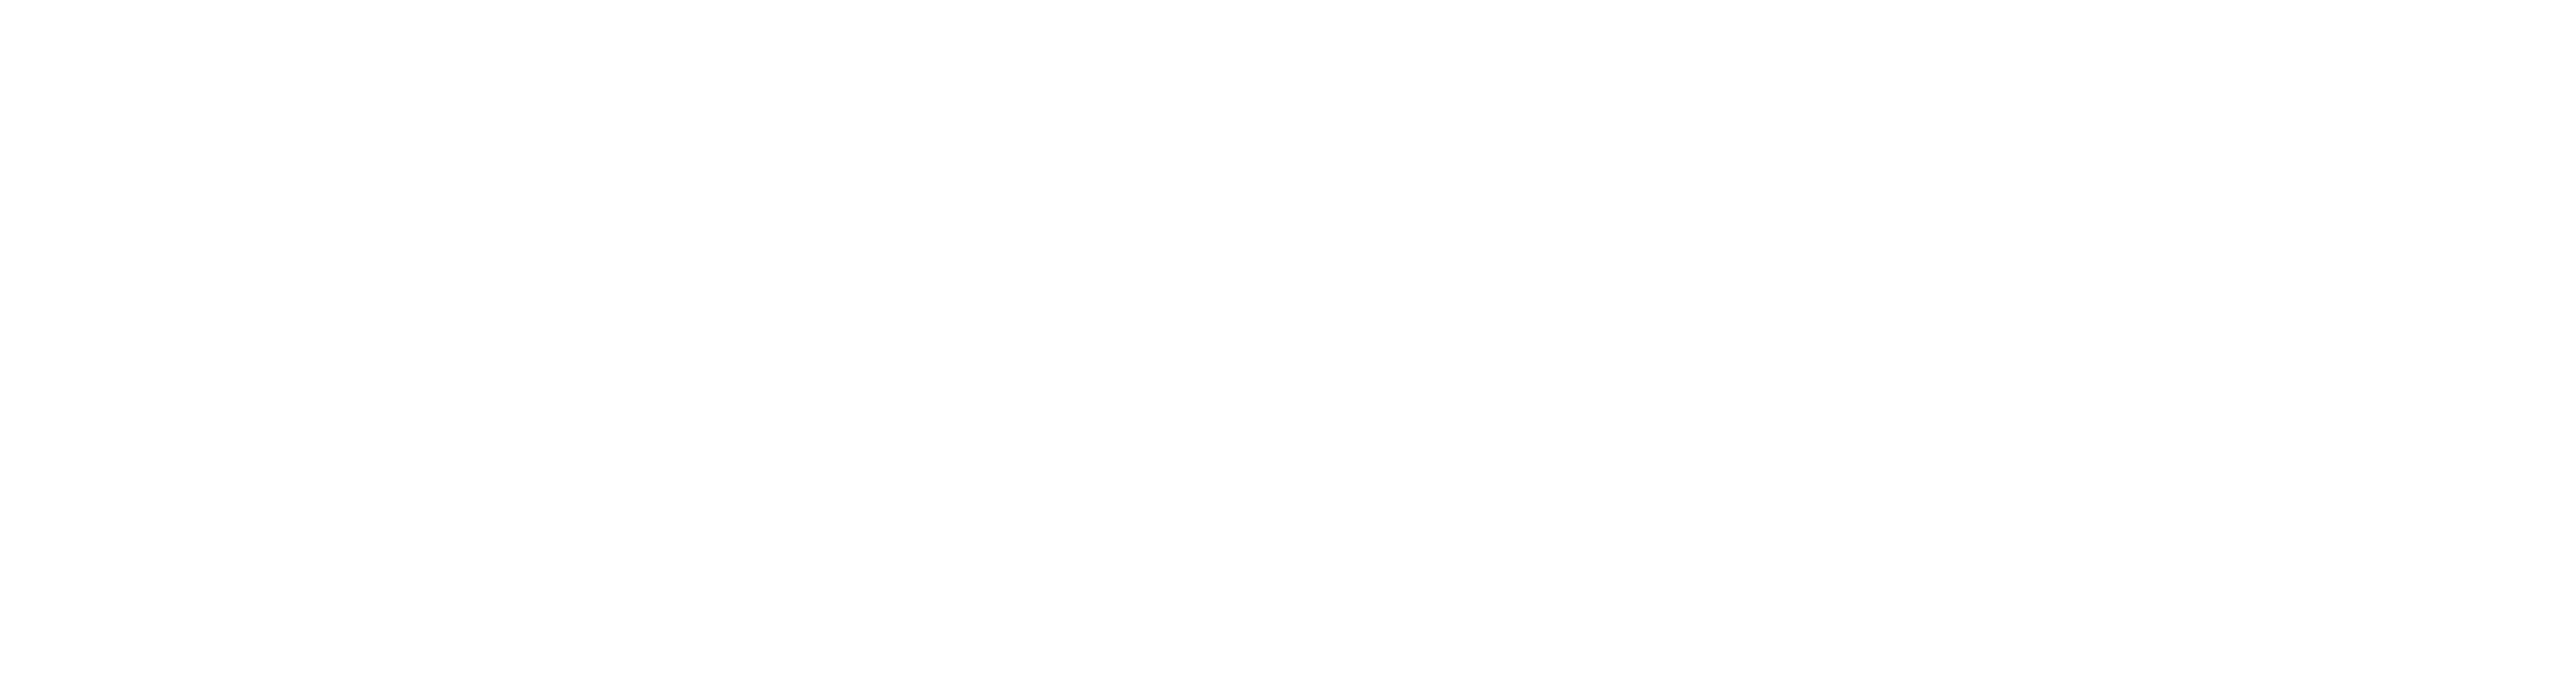 CD BABY Logo